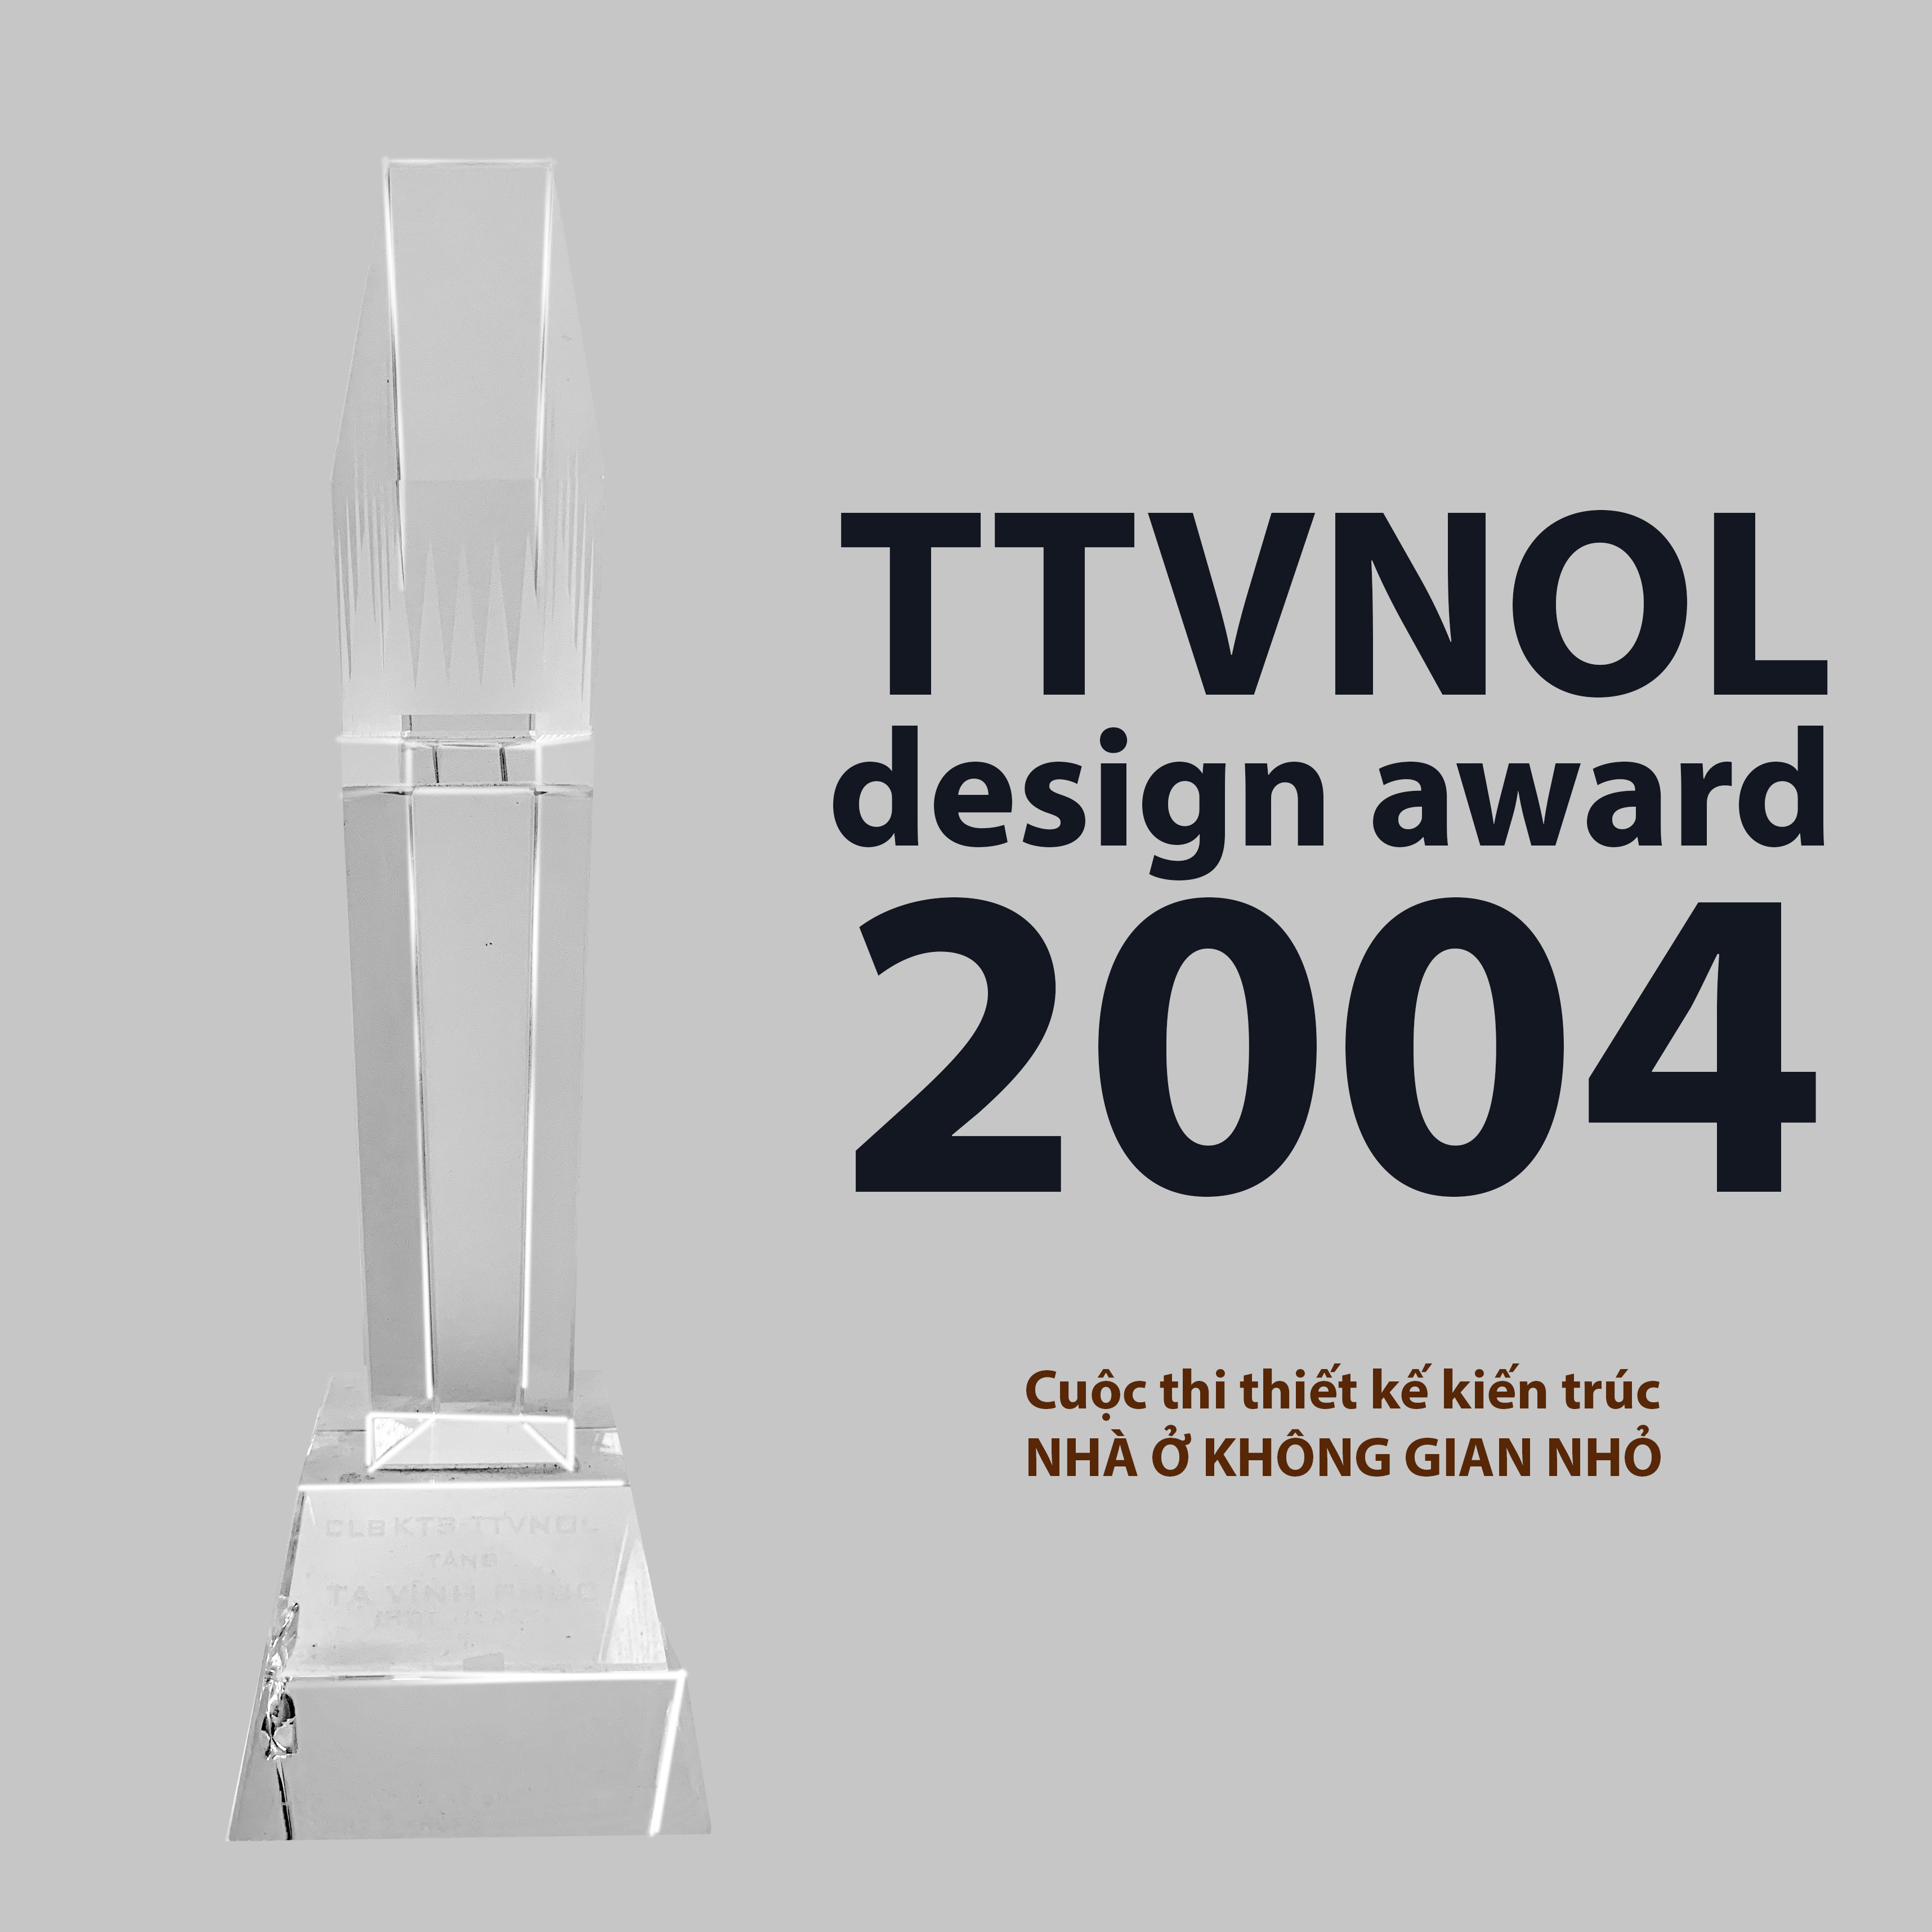 TTVNOL Design Awards 2004